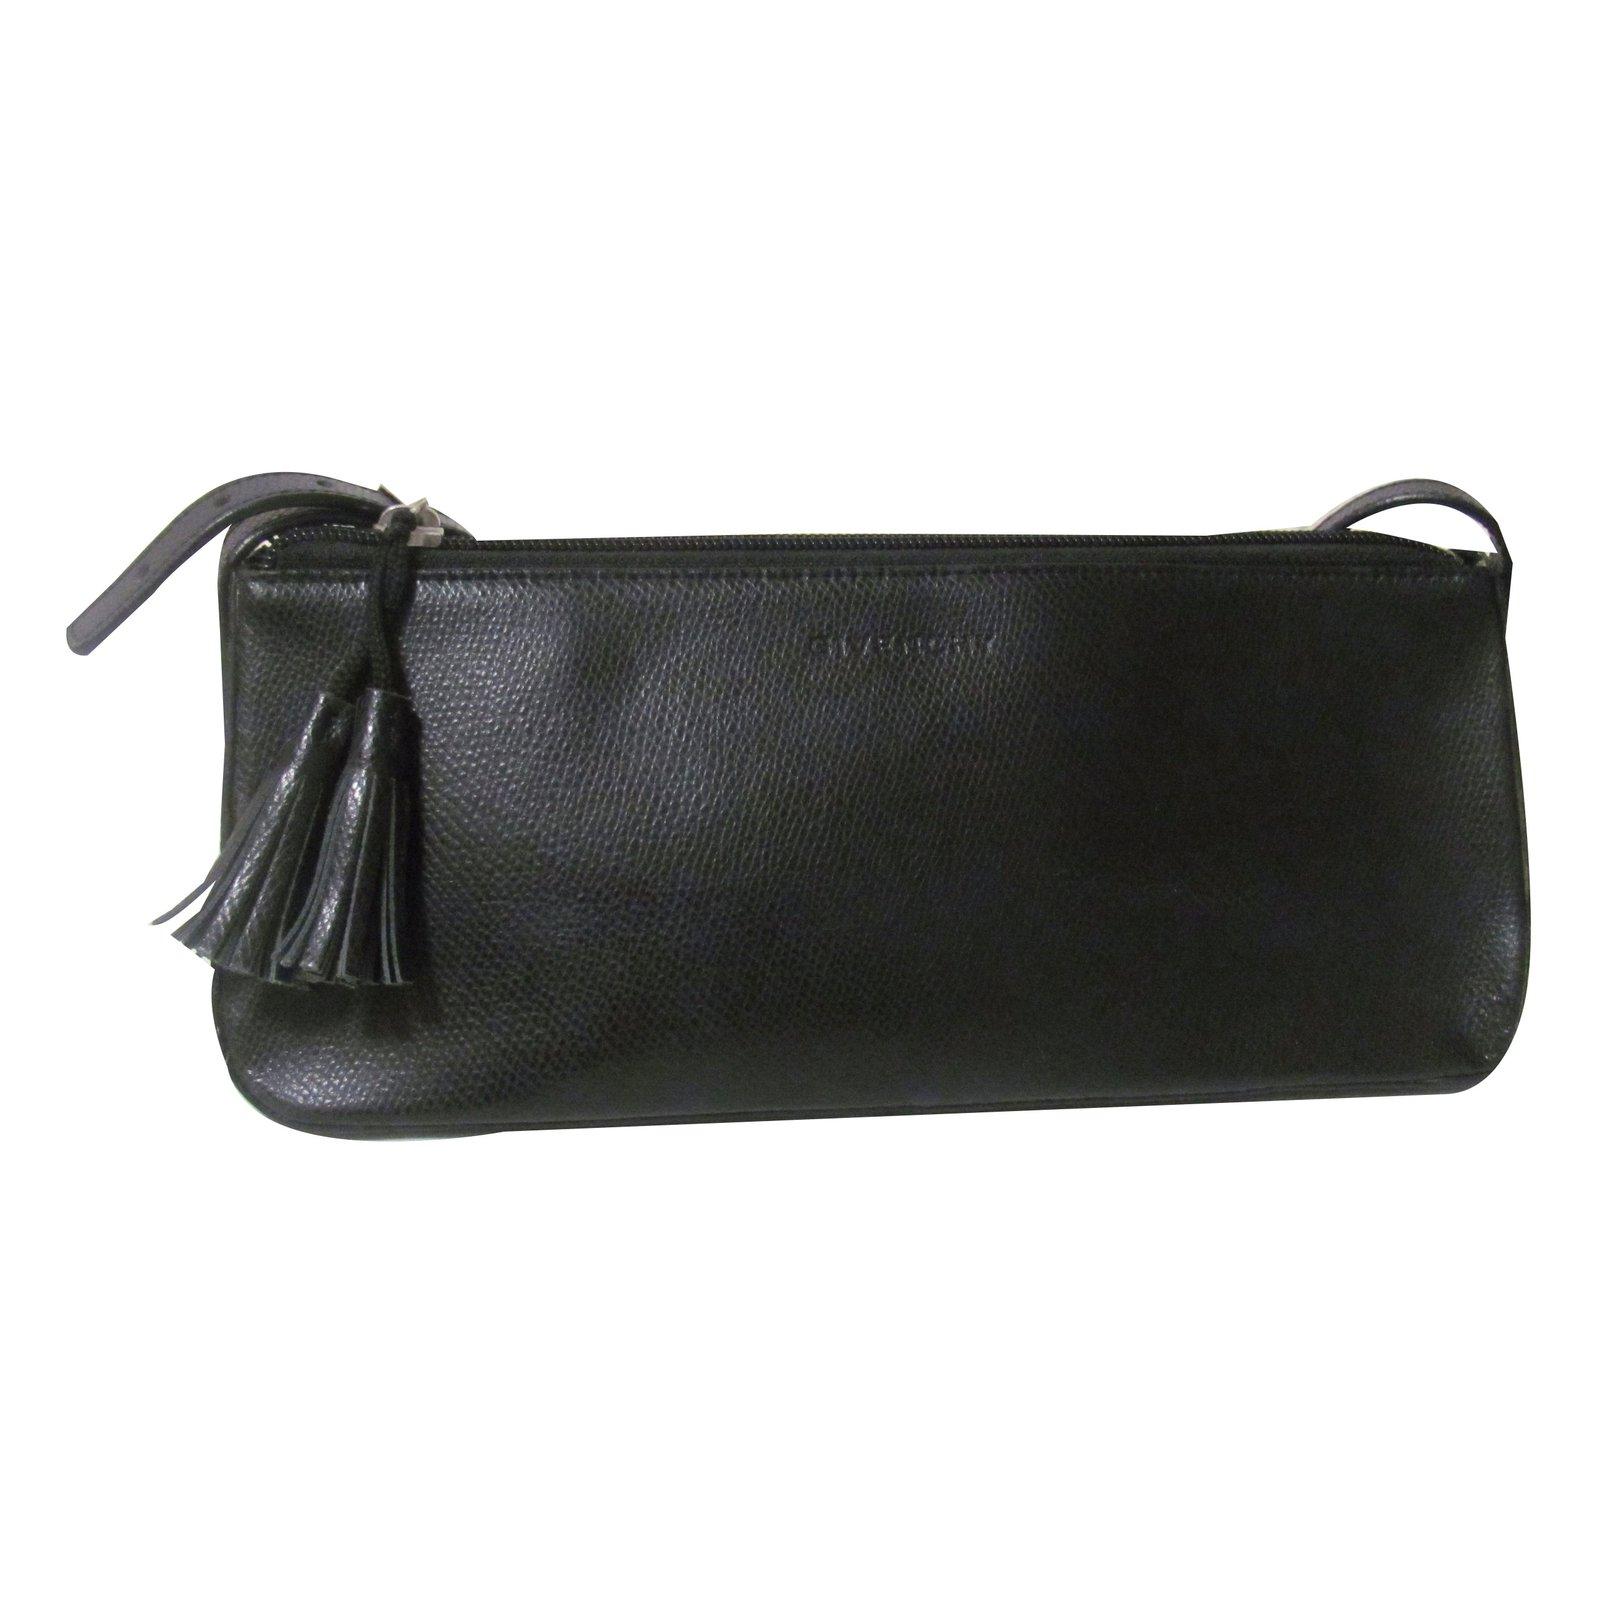 sacs main givenchy sac pochette cuir noir joli closet. Black Bedroom Furniture Sets. Home Design Ideas